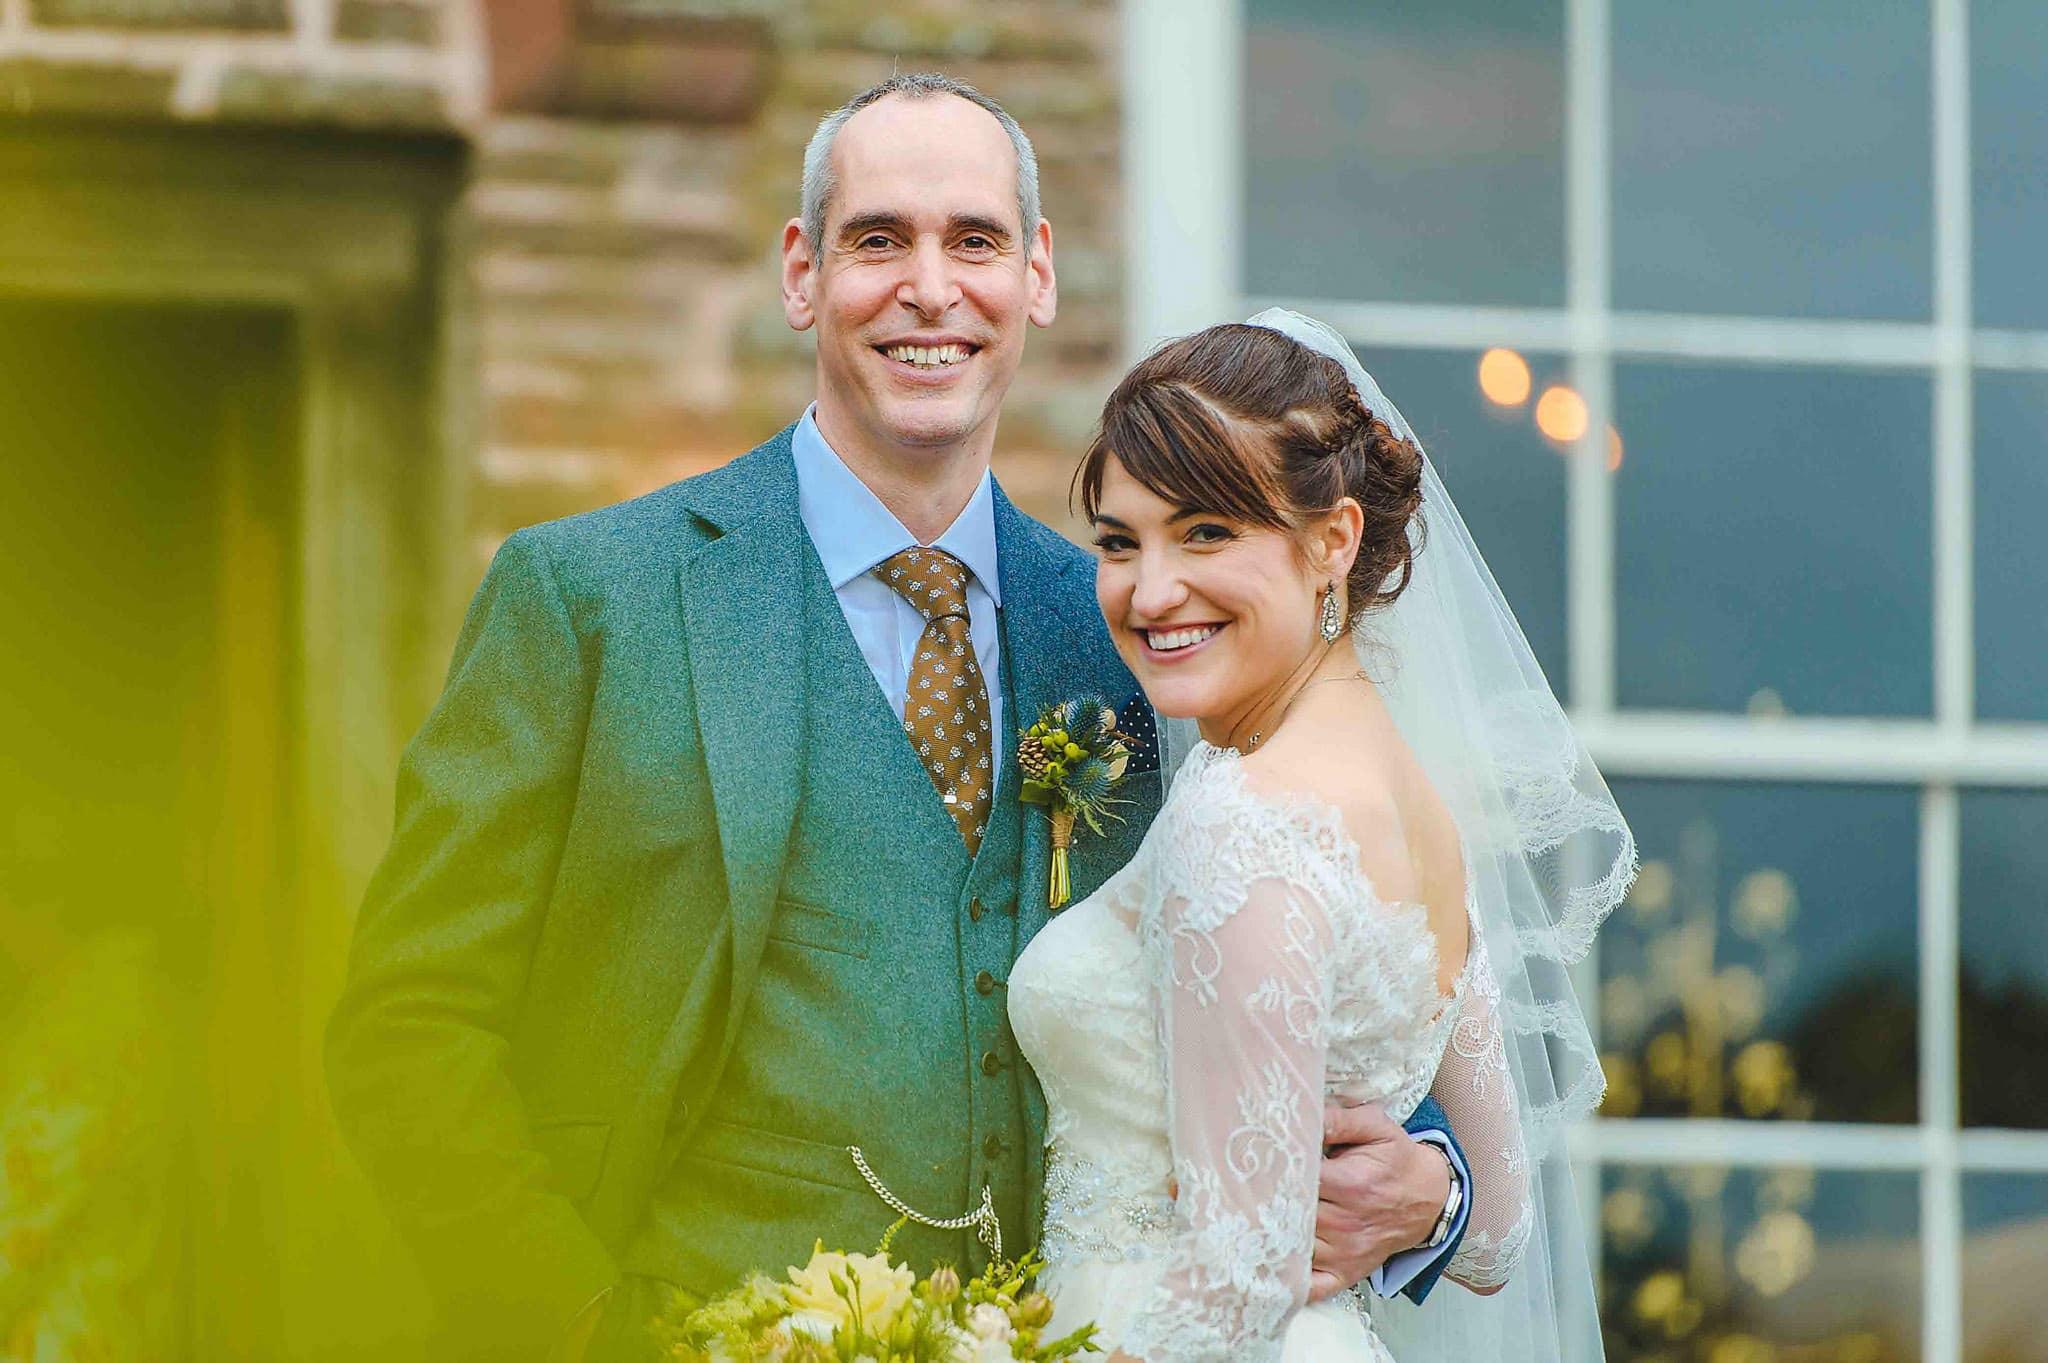 Dewsall Court wedding photography Herefordshire | Laura + Alex 86